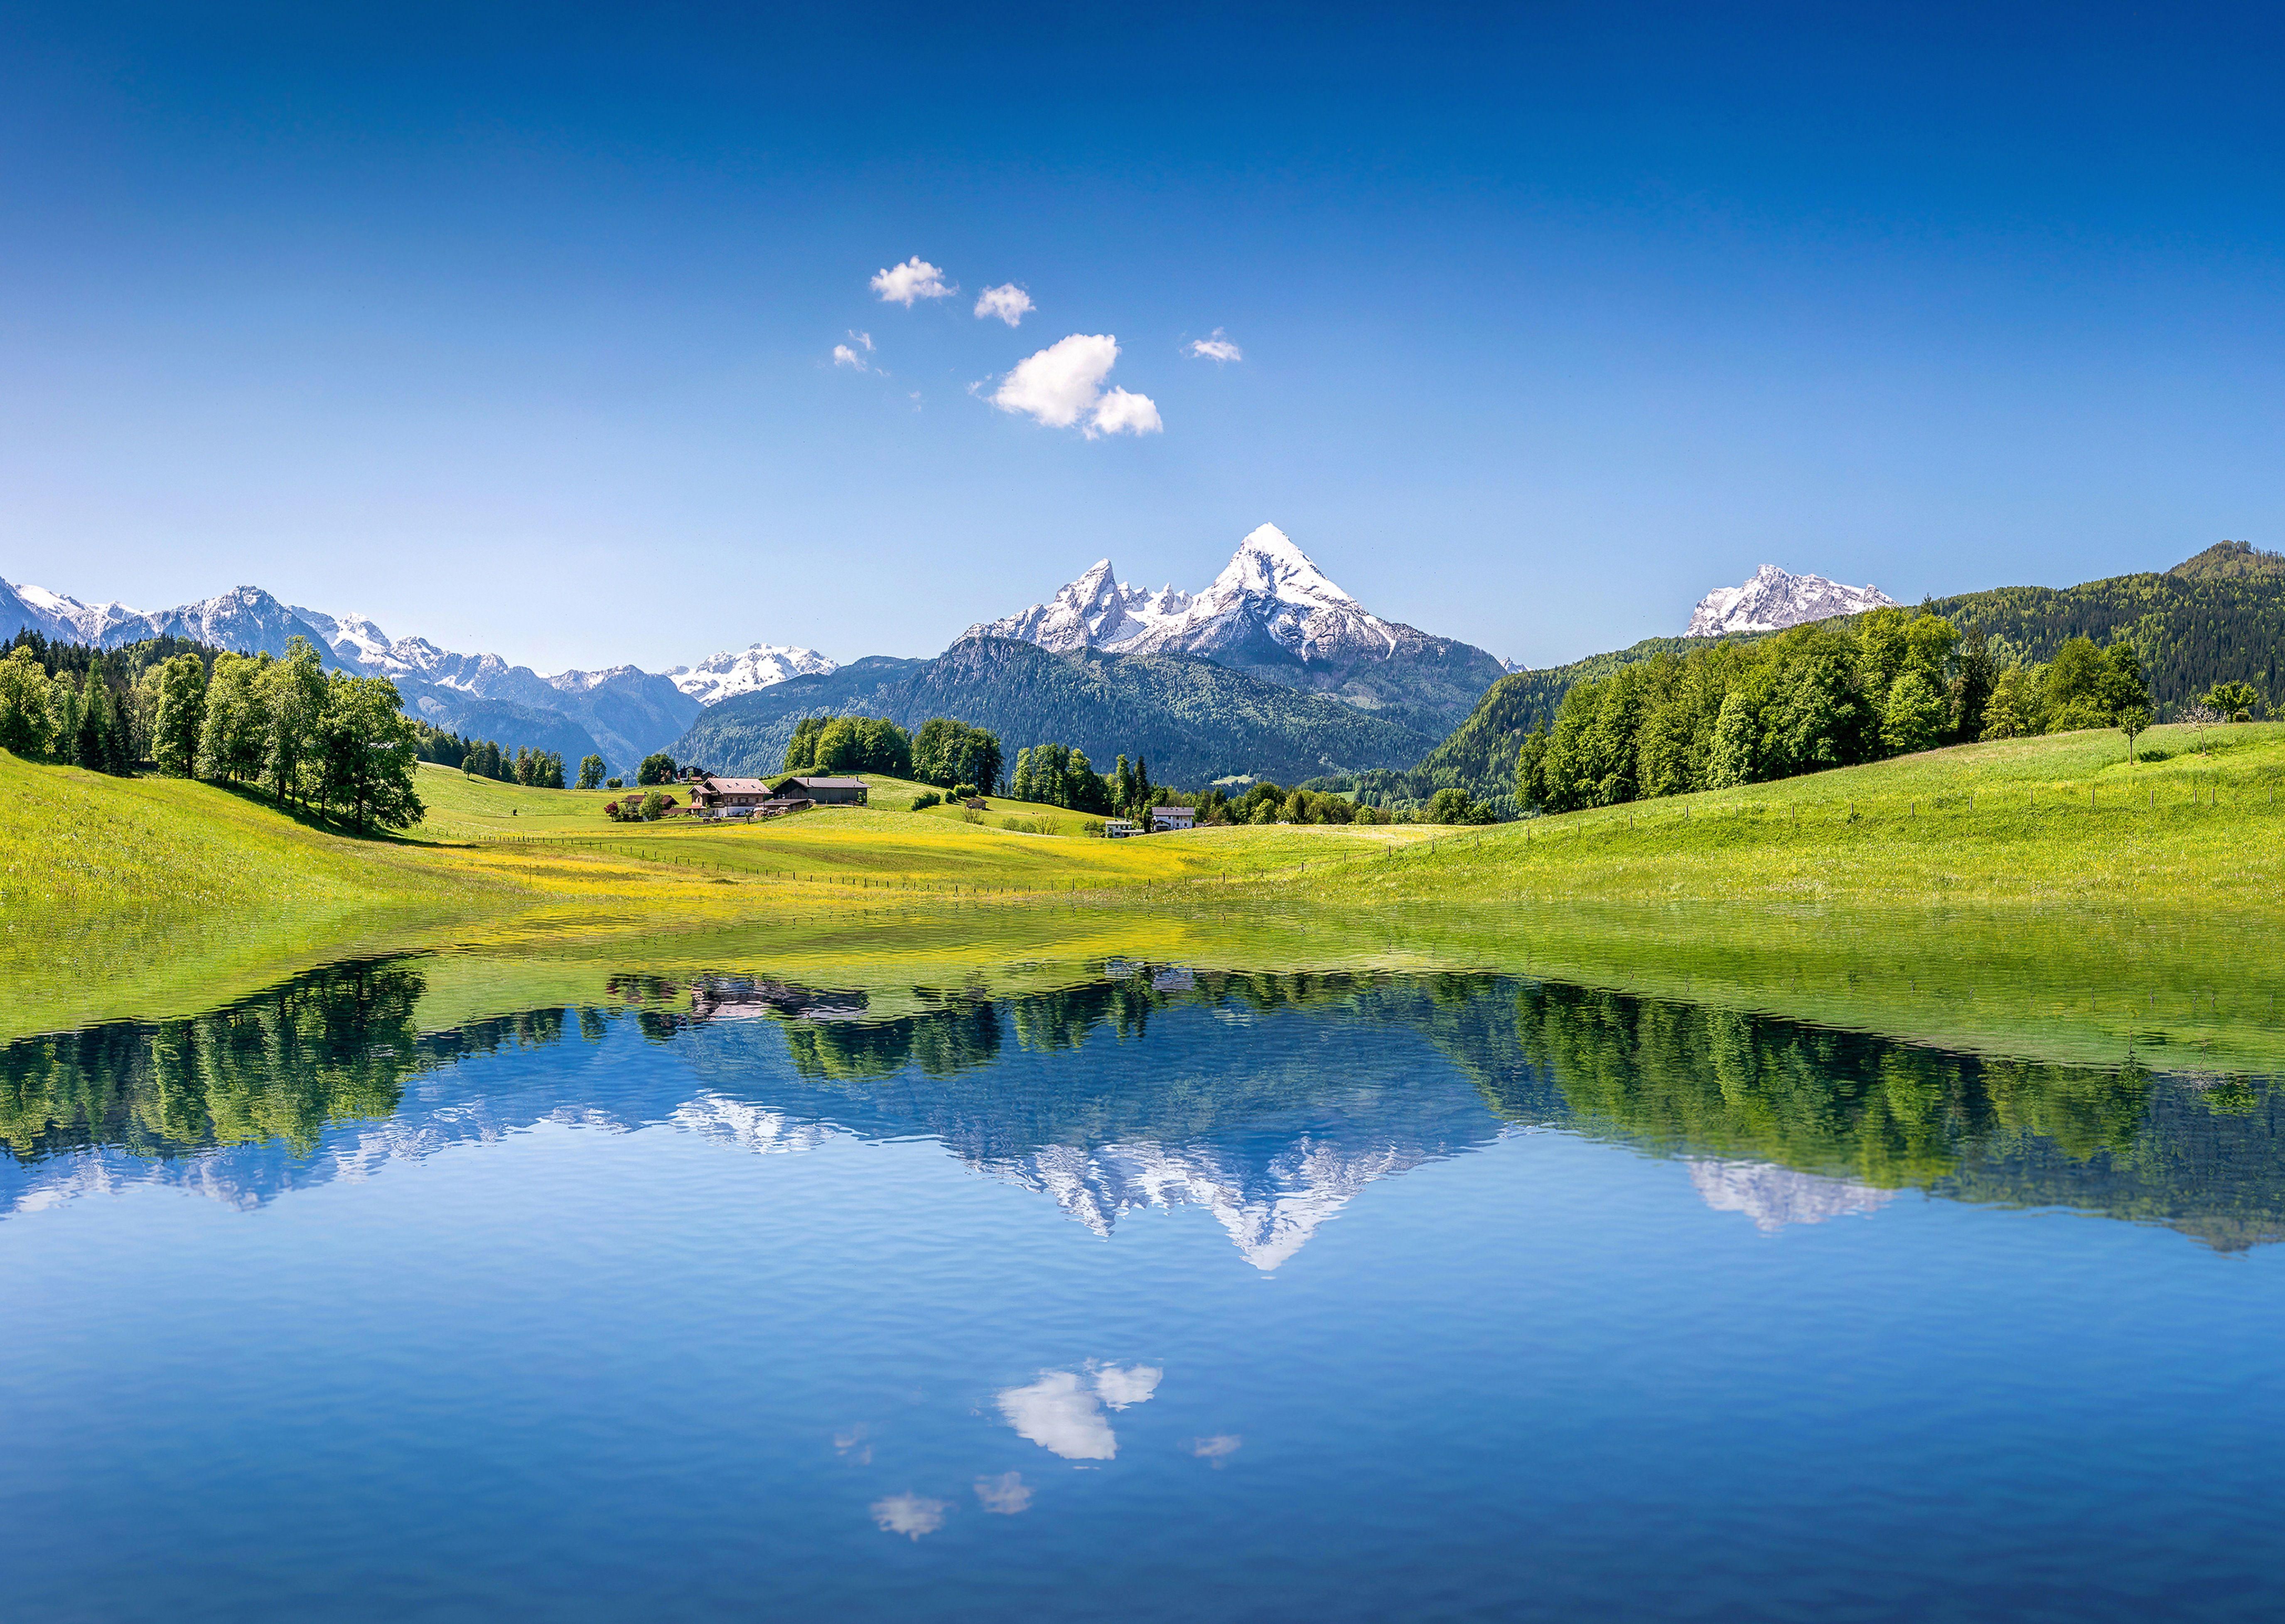 Summer Mountain Wallpapers   Top Summer Mountain Backgrounds 5500x3909